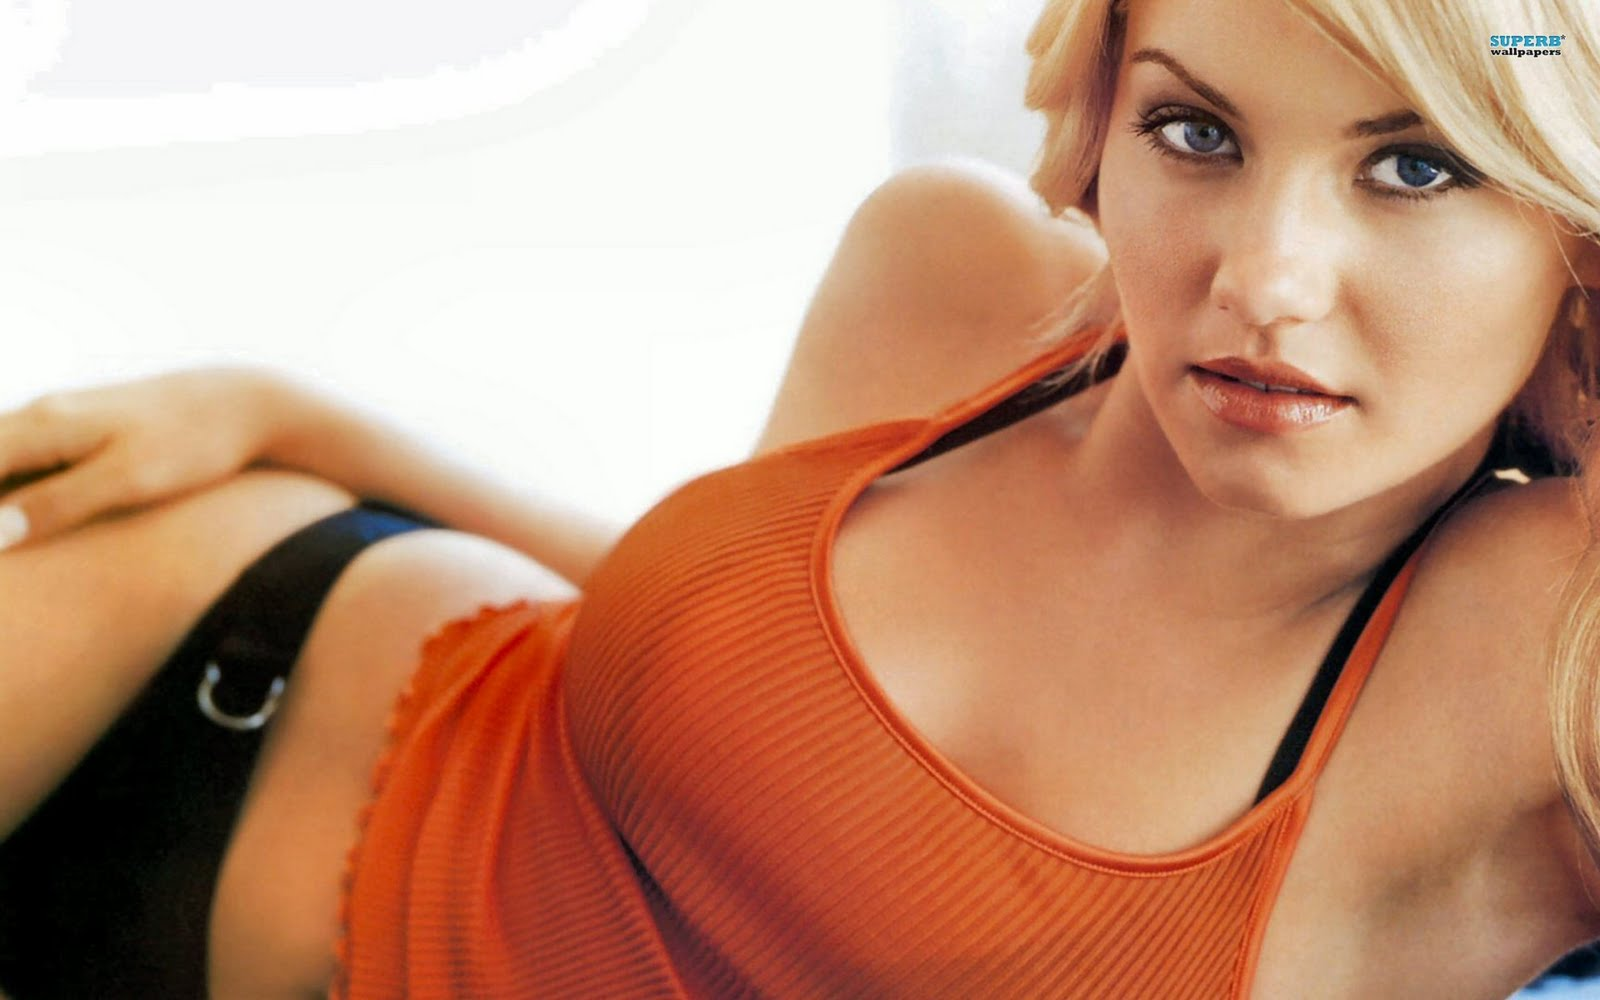 hot woman wallpapers: cute and beautiful girls wallpaper pack 9